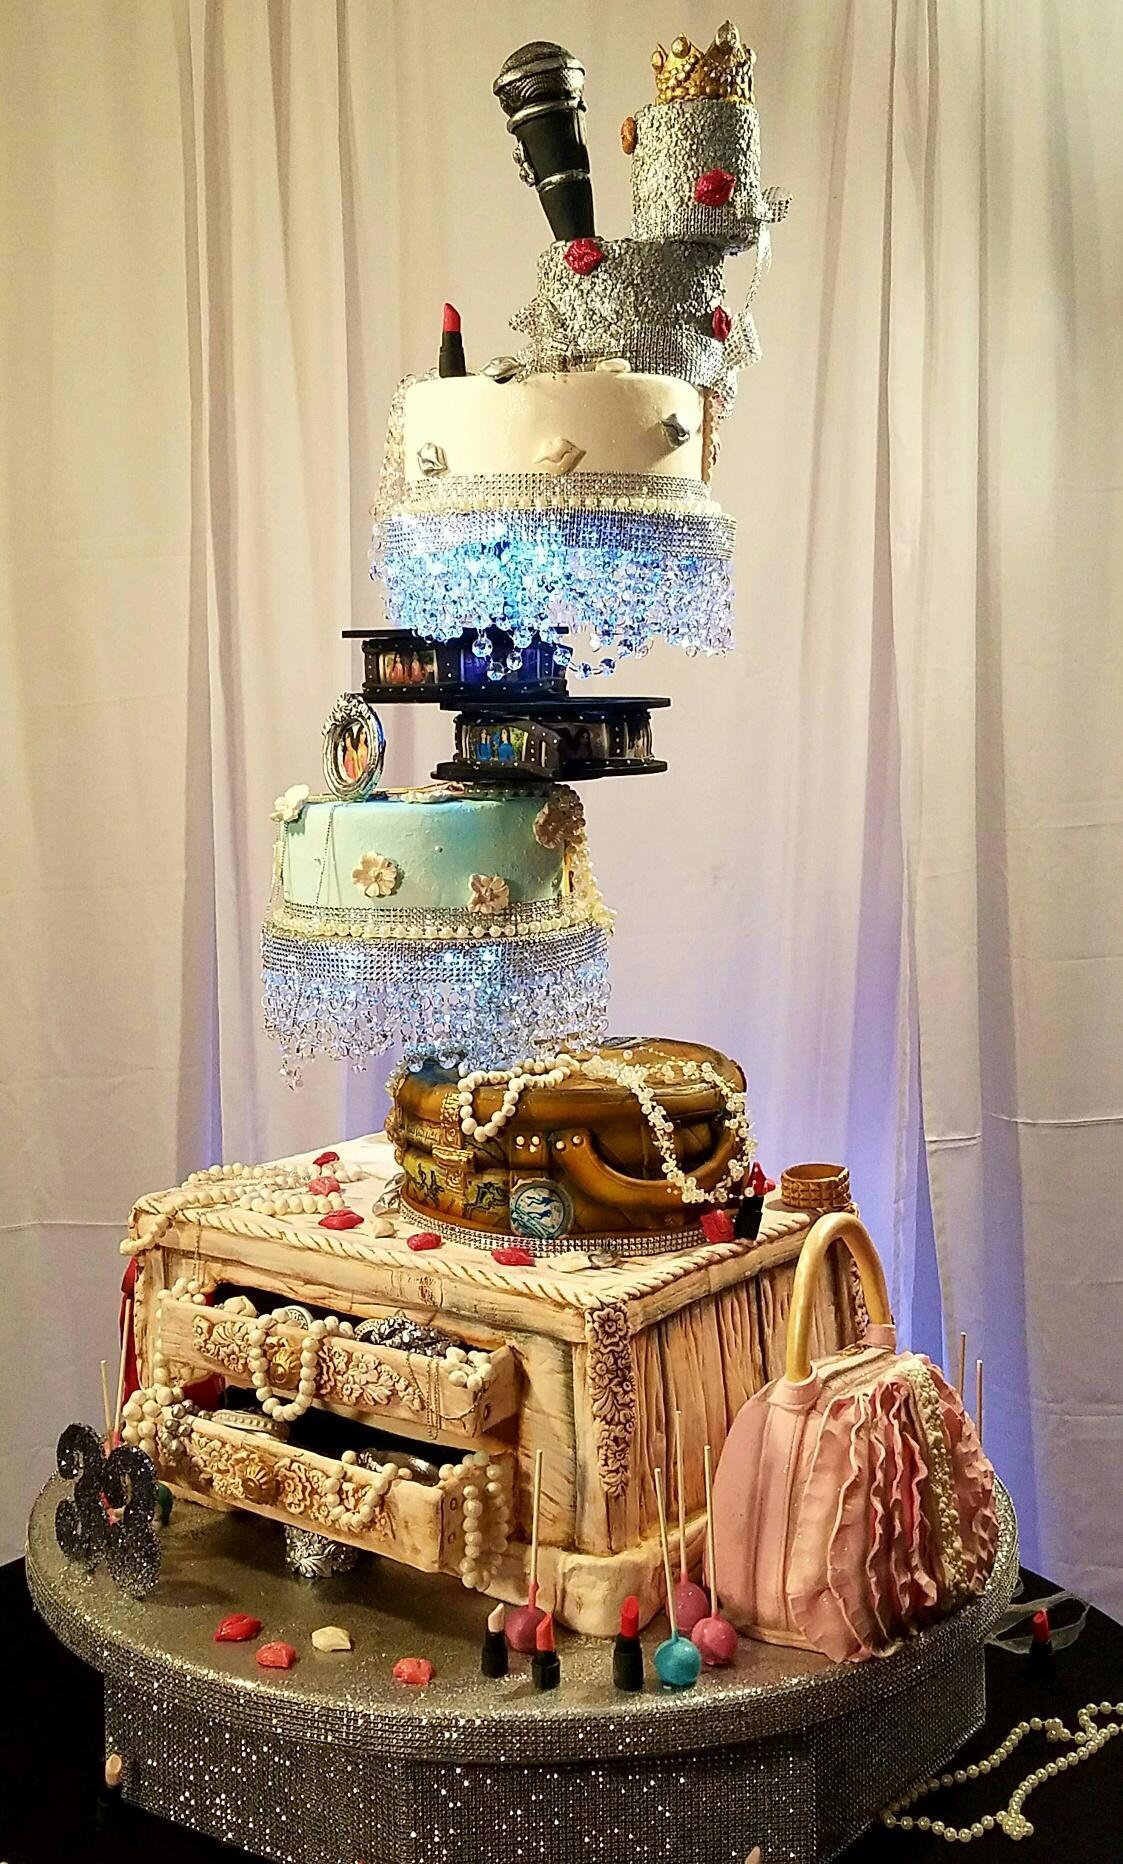 Topsy Turvy handbag themed cake